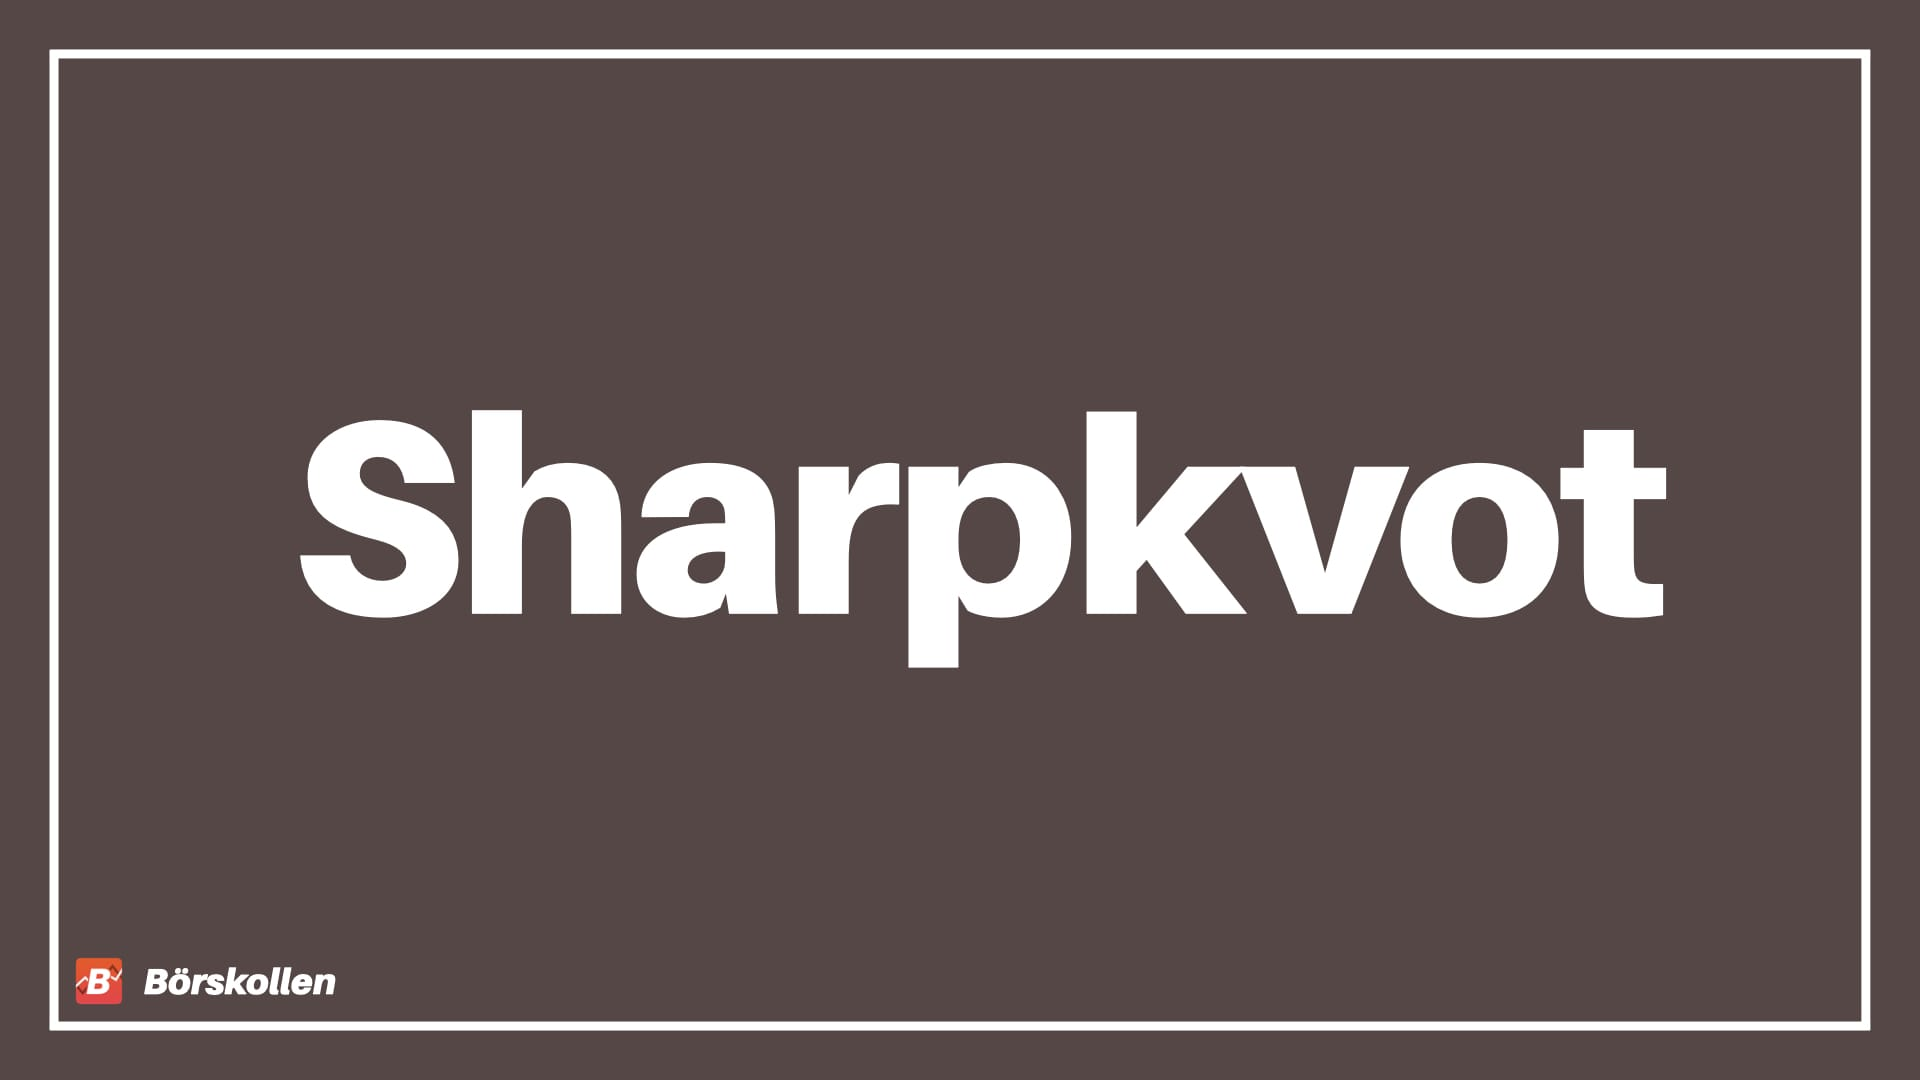 Sharpekvot – Vad är Sharpekvot?